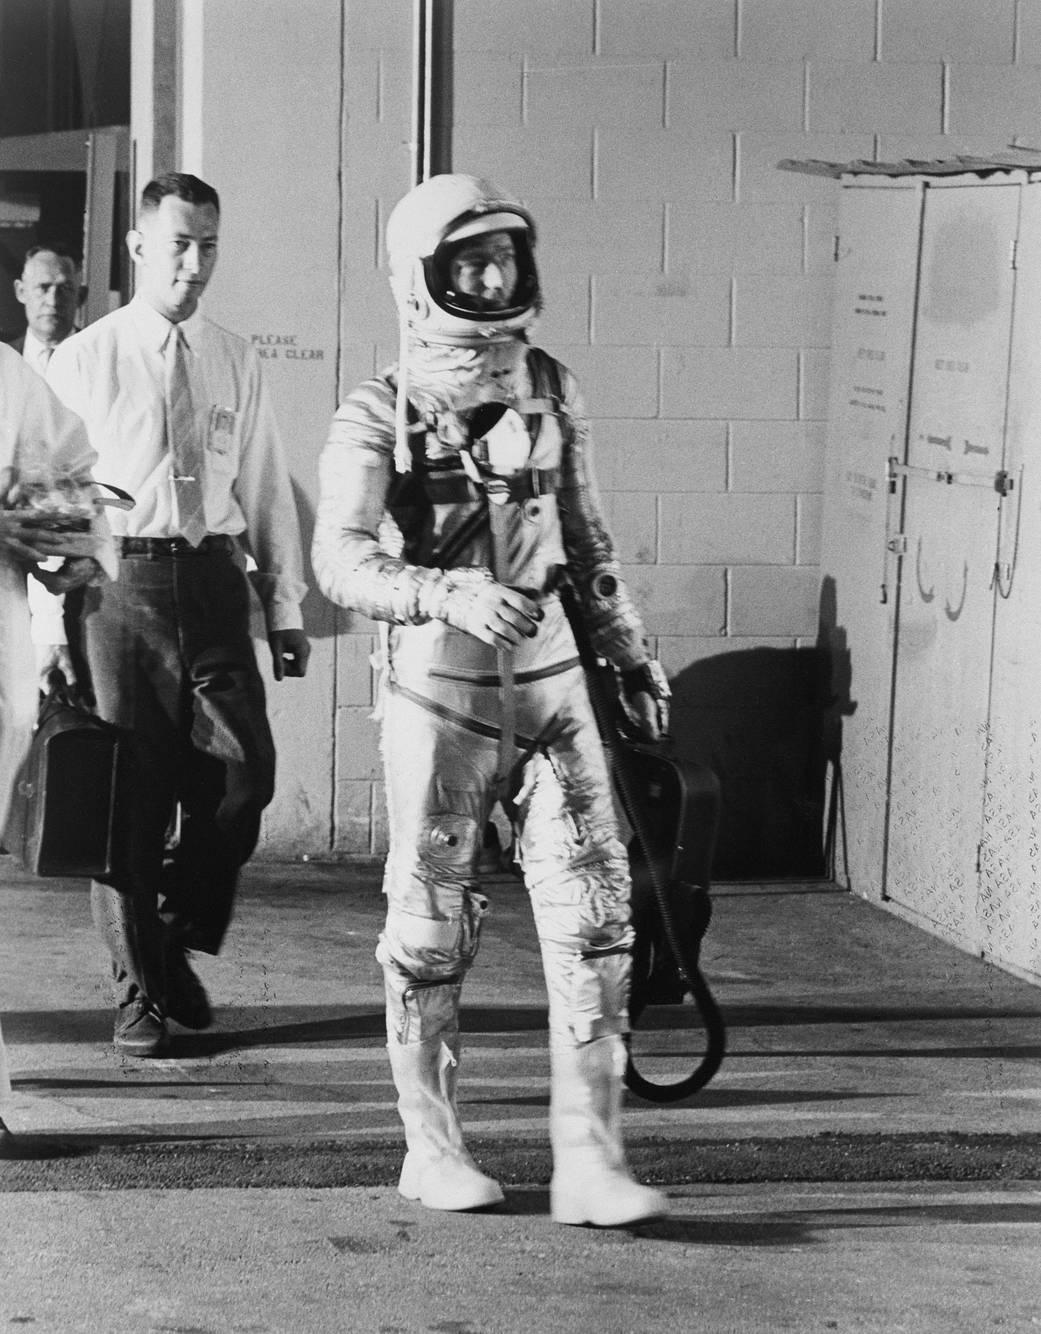 Scott Carpenter Walking to Mercury Atlas 7 launch,1962